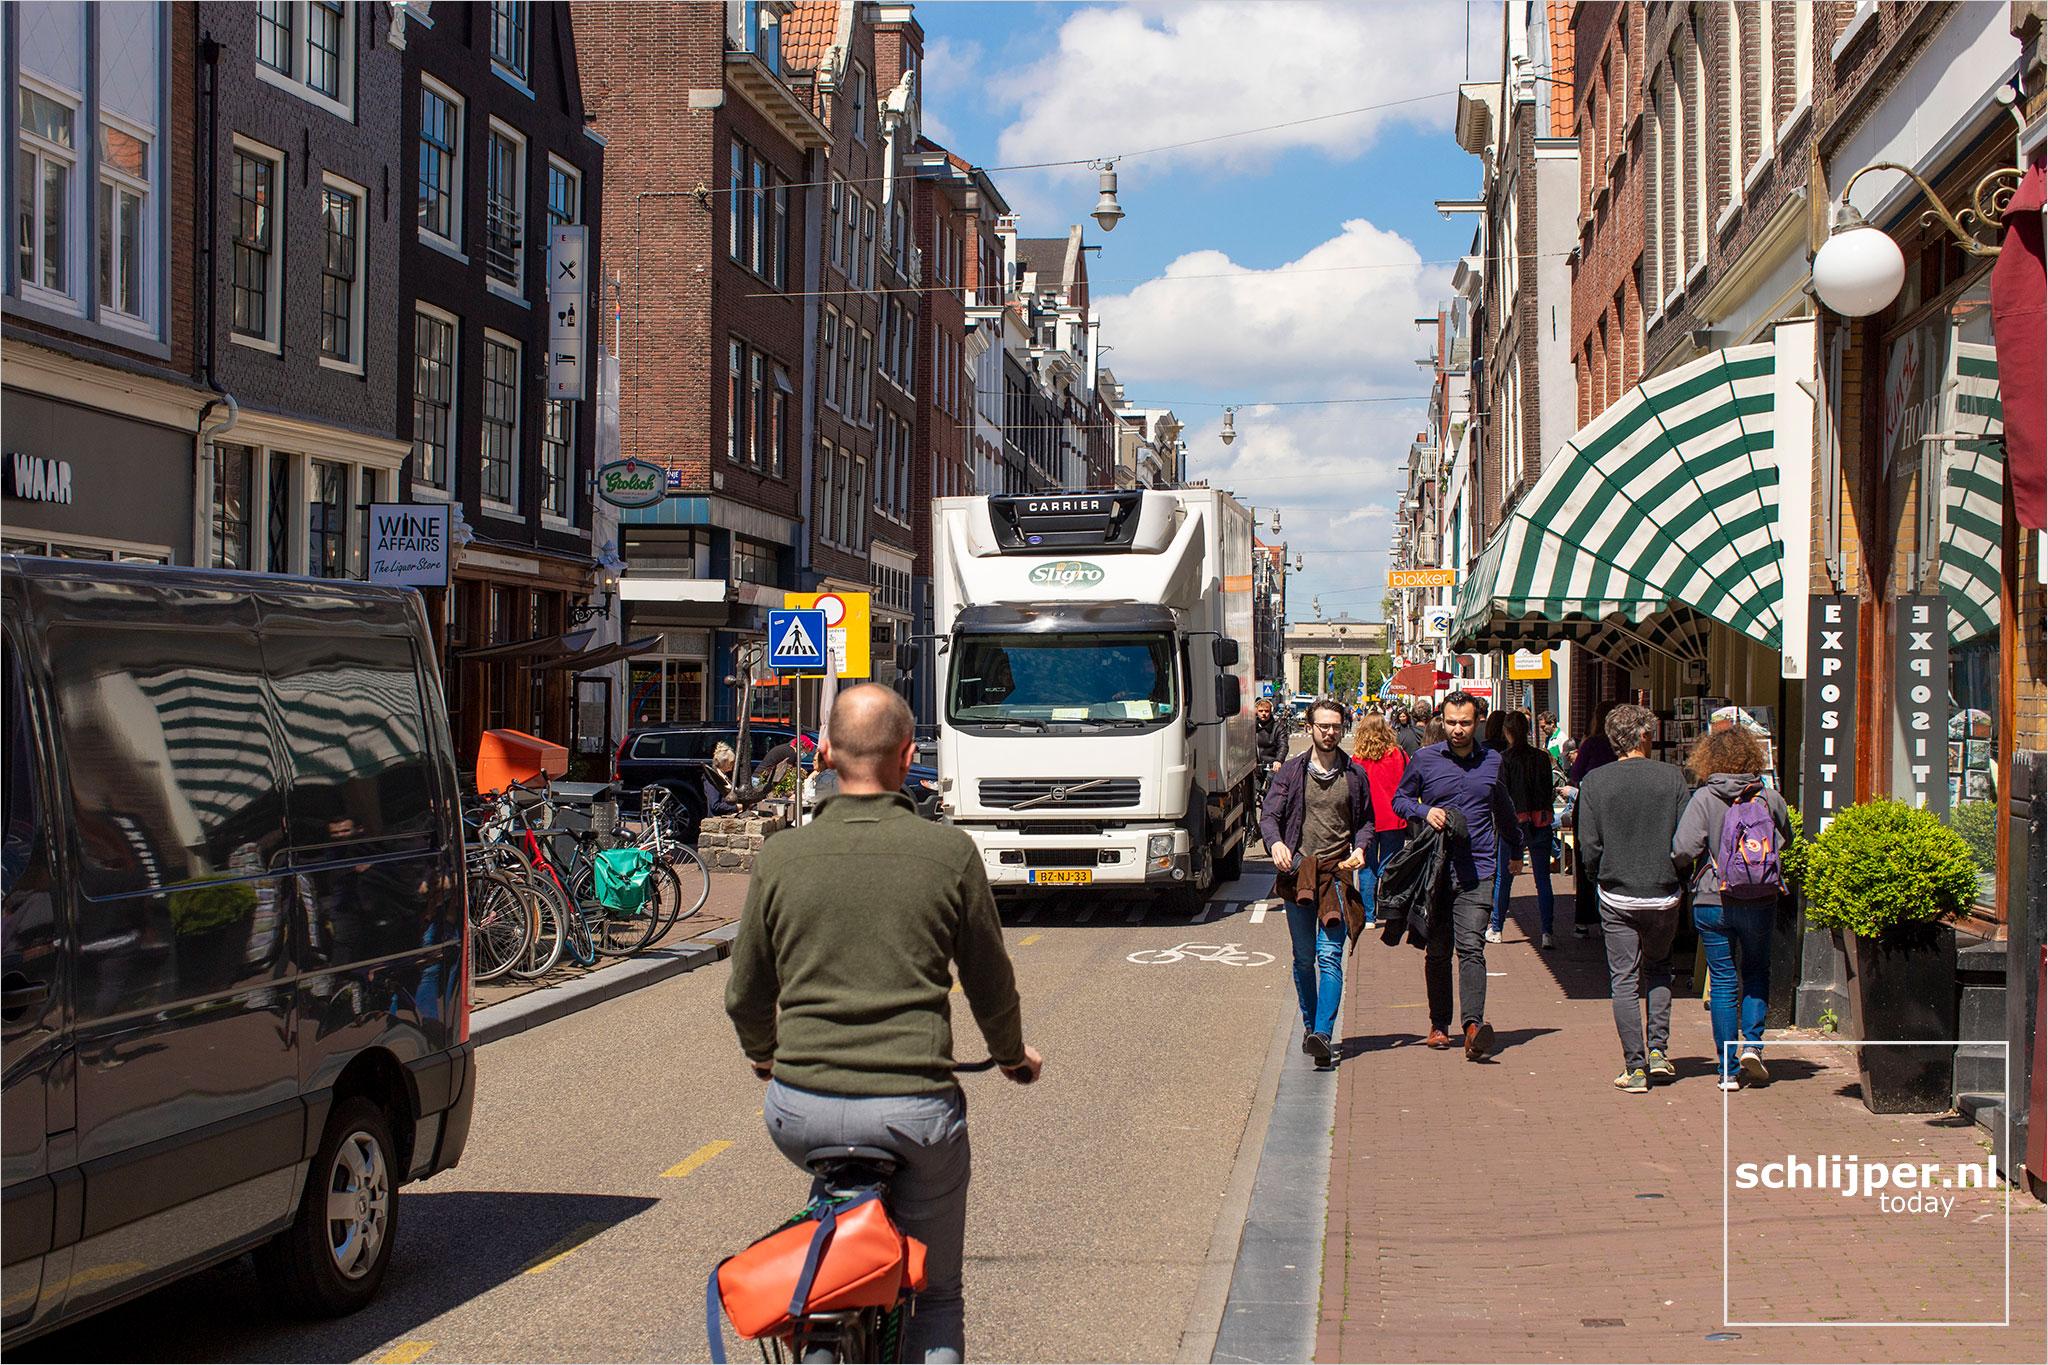 The Netherlands, Amsterdam, 28 mei 2021